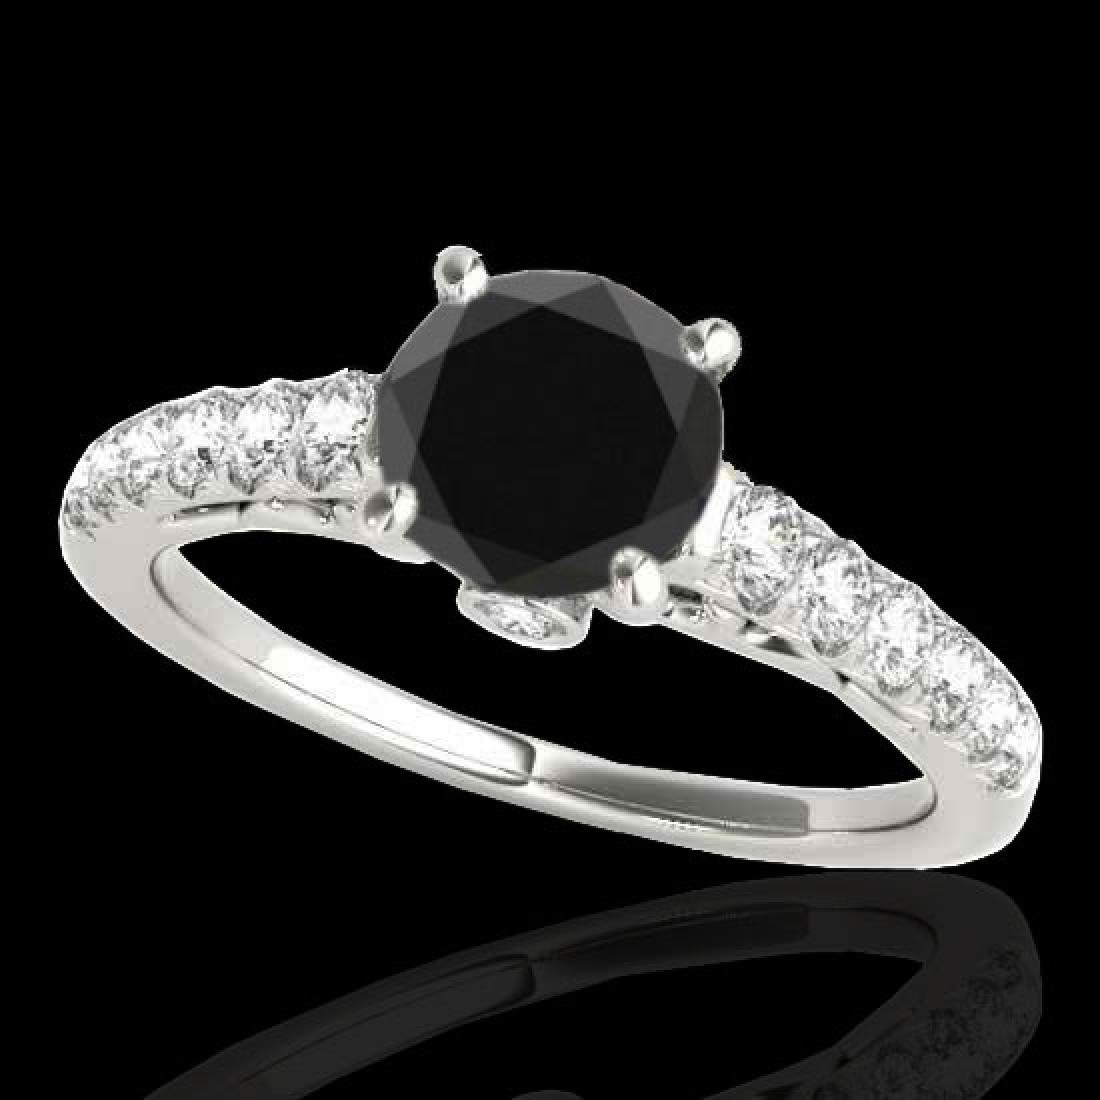 1.75 CTW Certified VS Black Diamond Solitaire Ring 10K